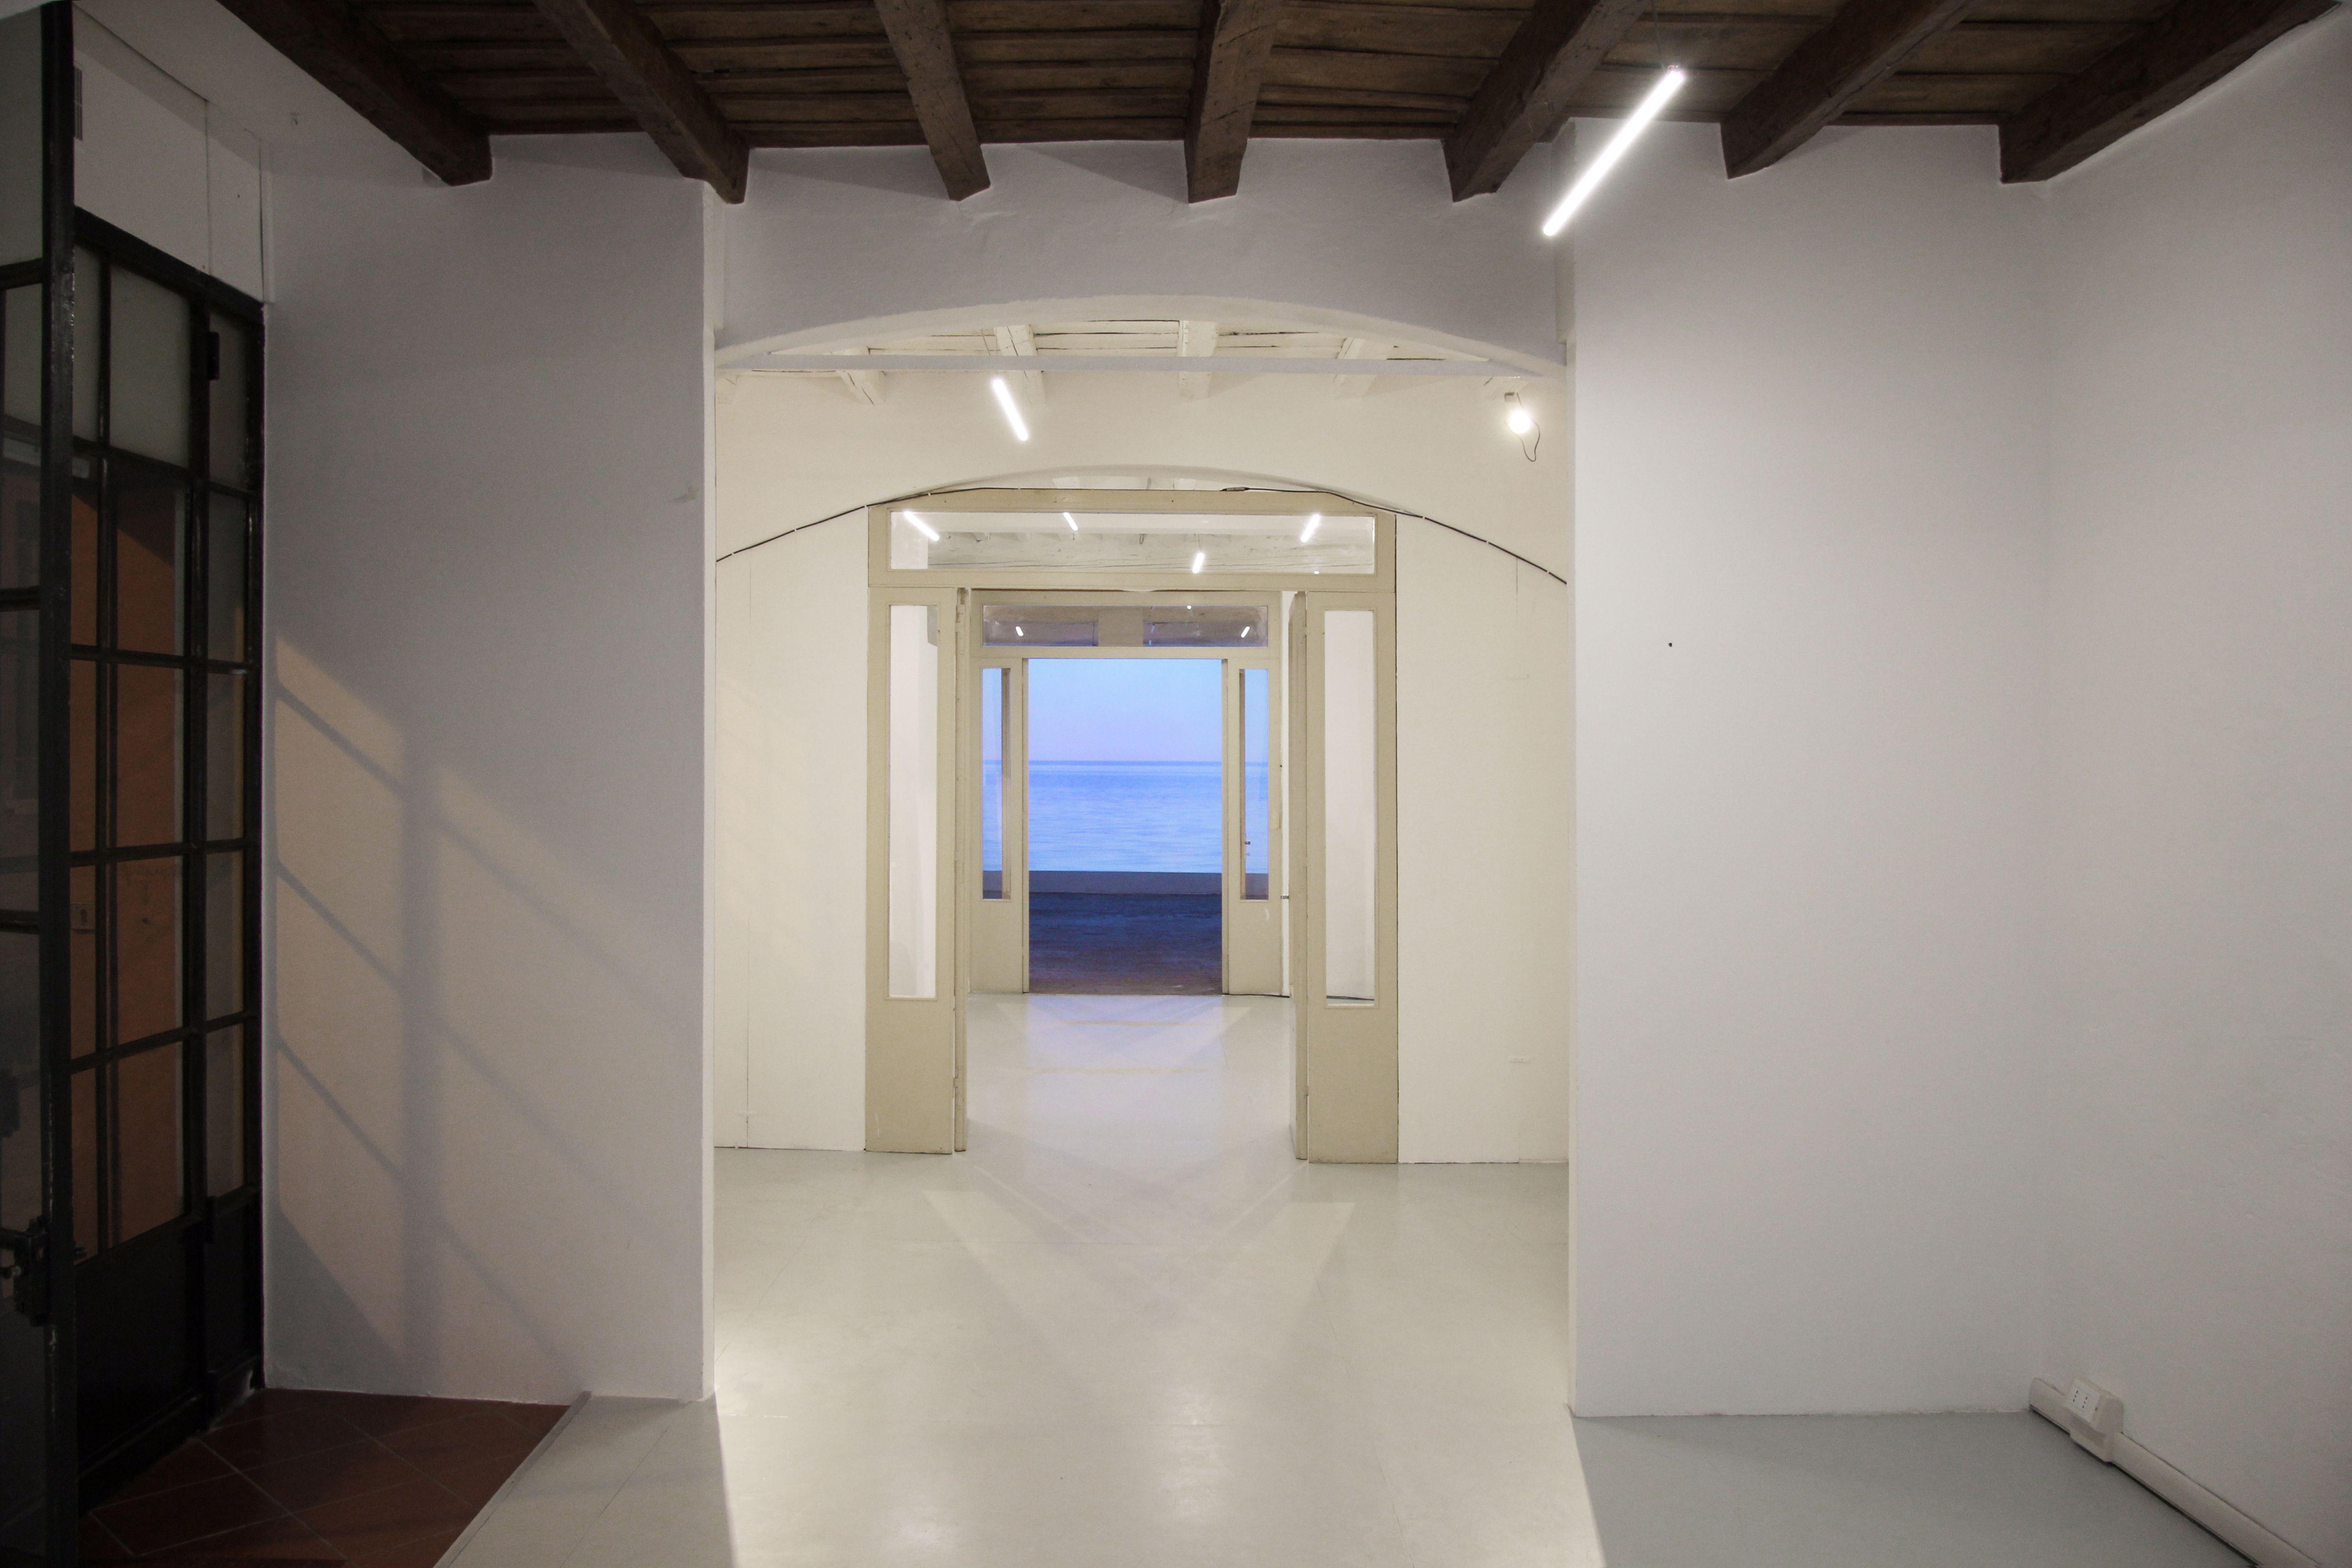 Irene Fenara, Se il cielo fugge. Veduta della mostra. Foto di Irene Fenara